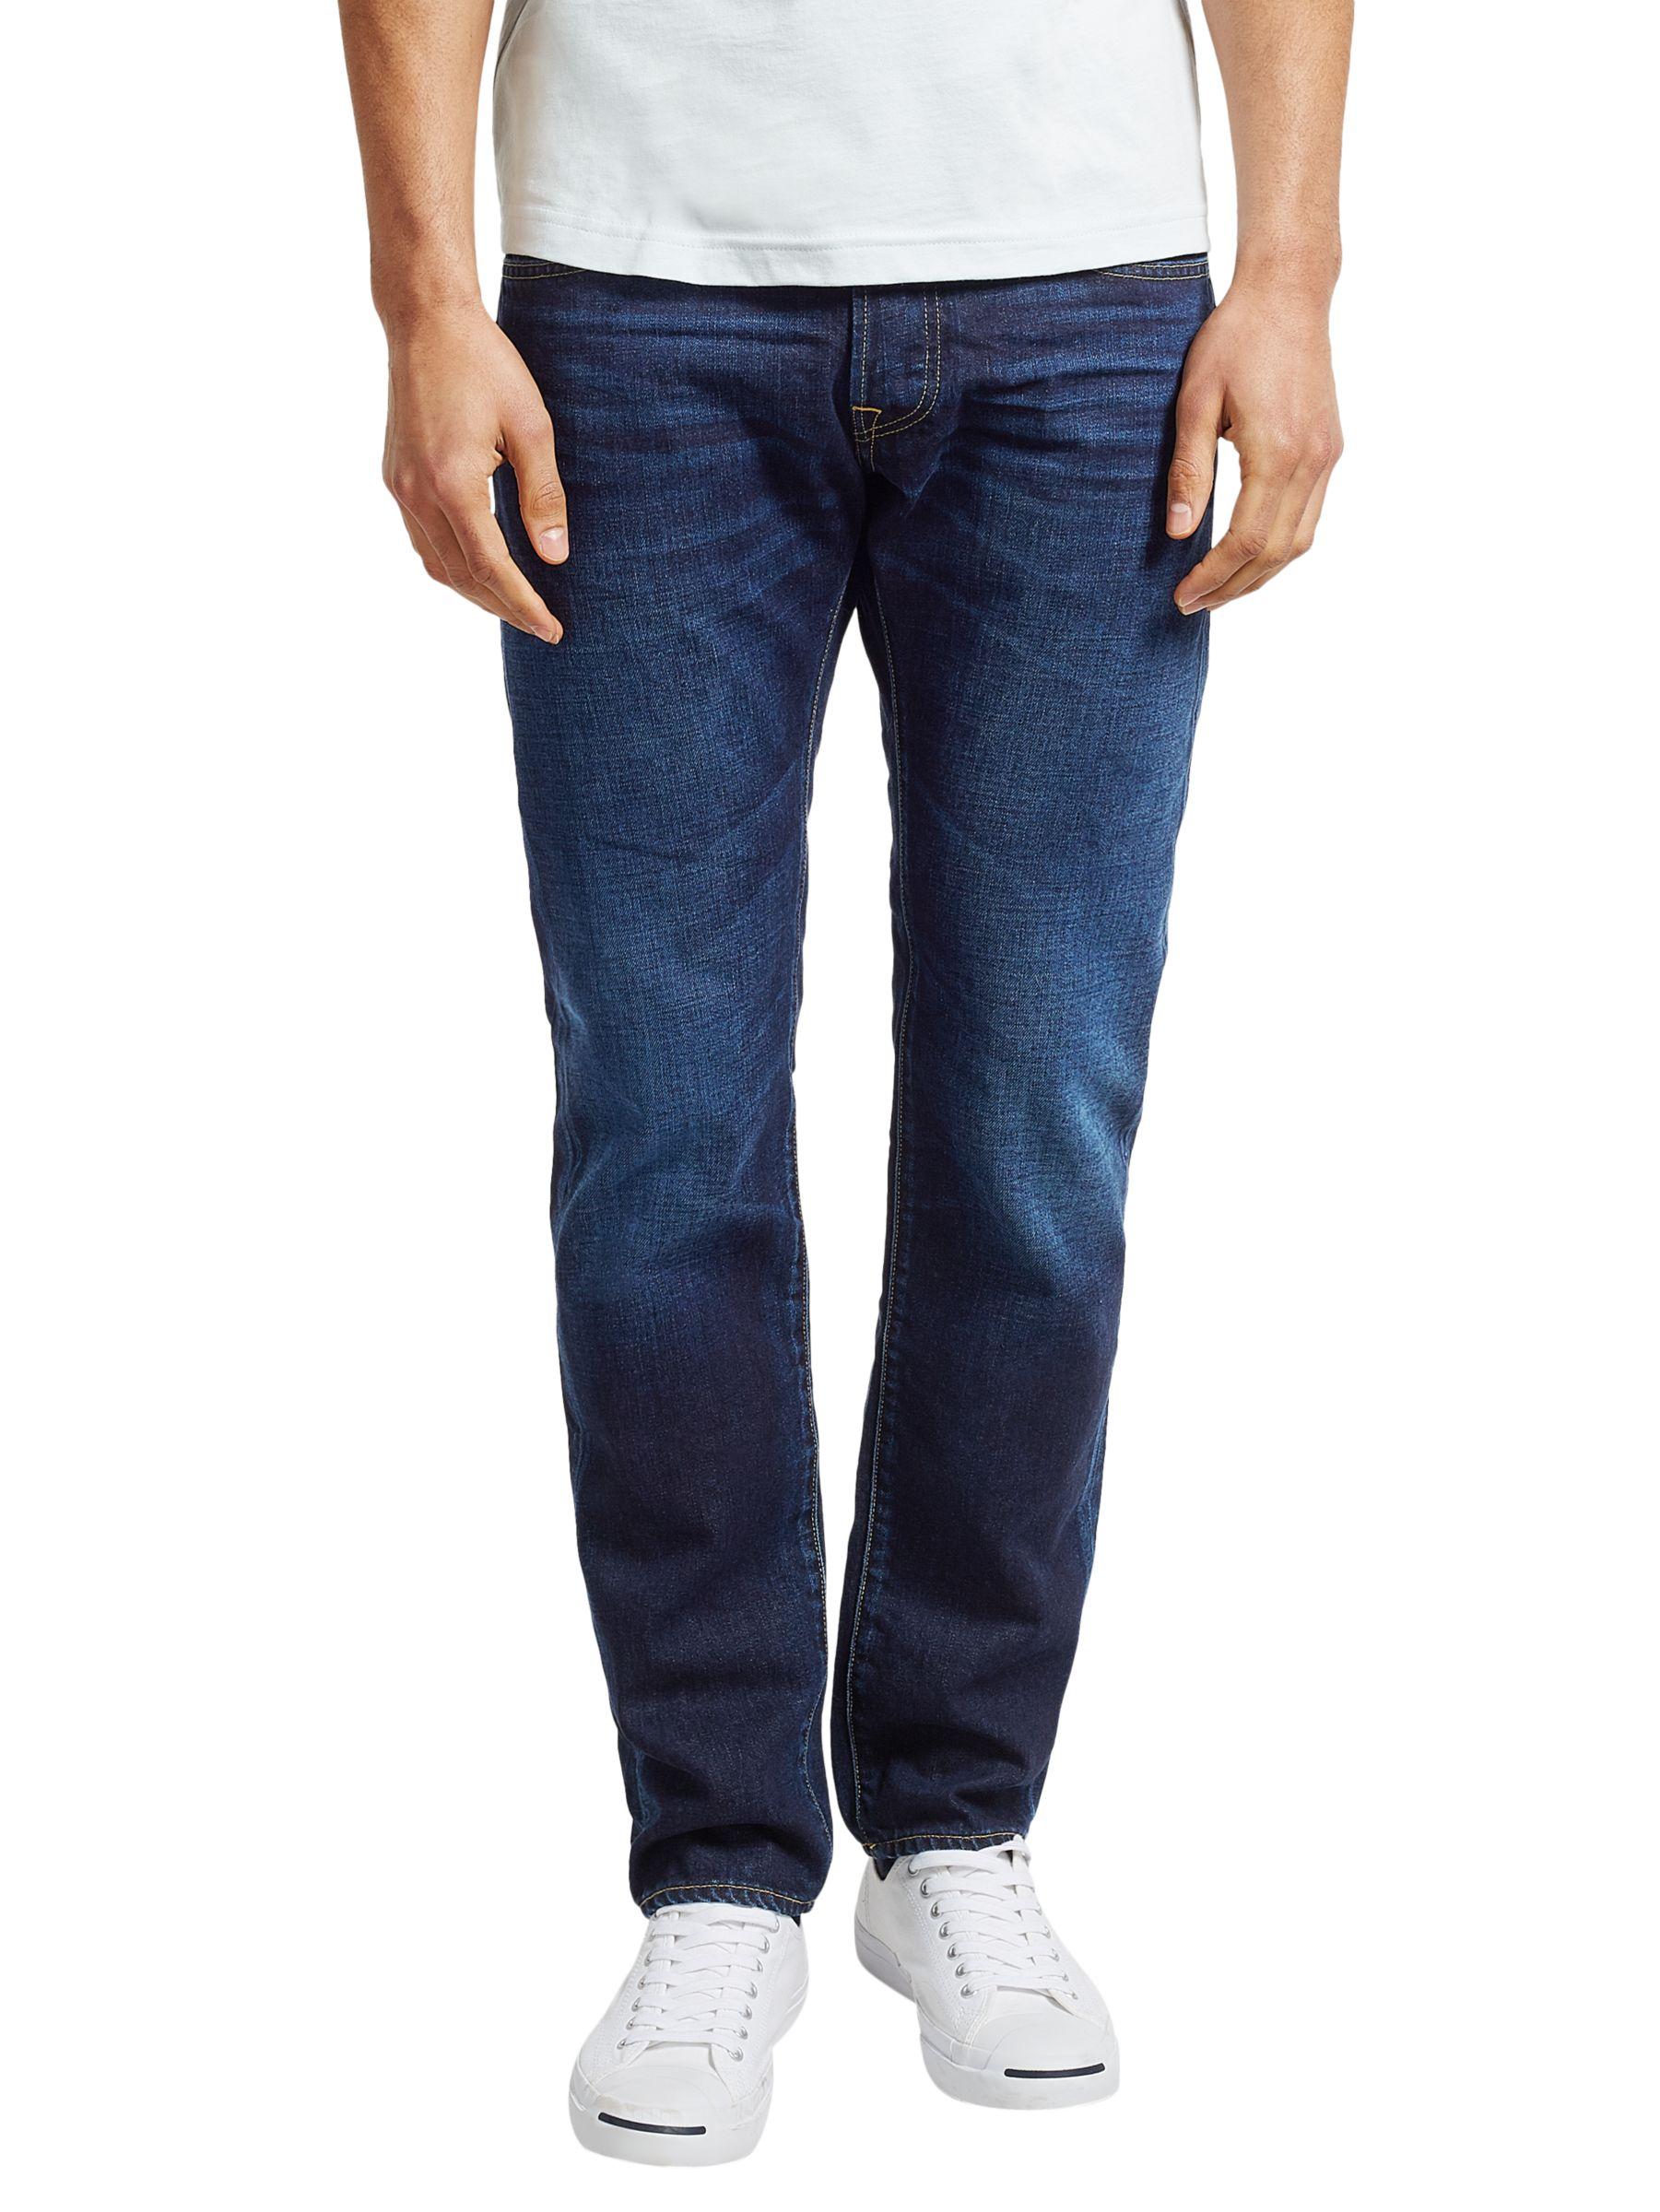 Edwin Edwin ED-55 Relaxed Tapered Jeans, Deep Blue Denim Coal Wash